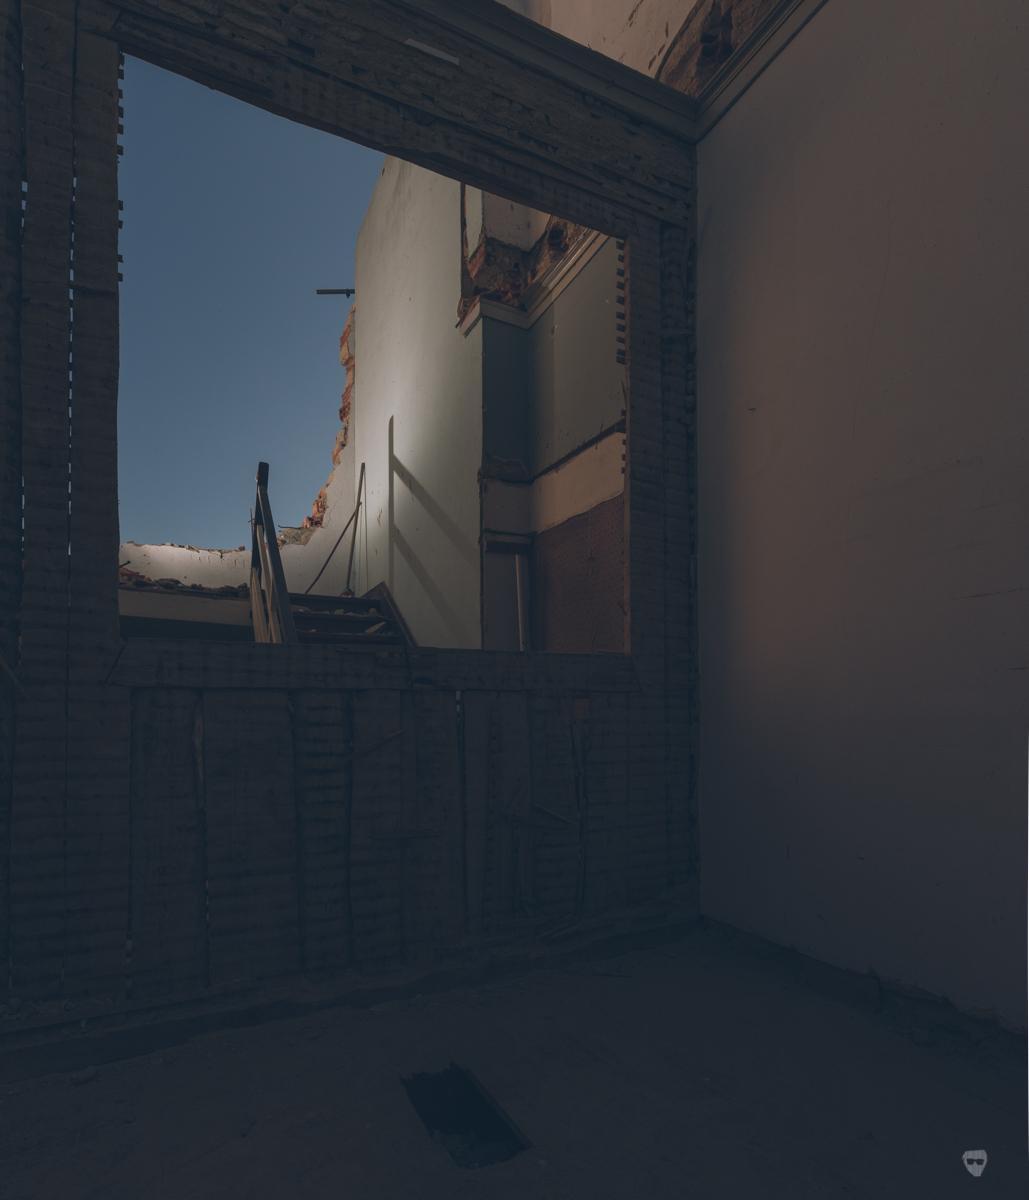 demolicao-7.jpg